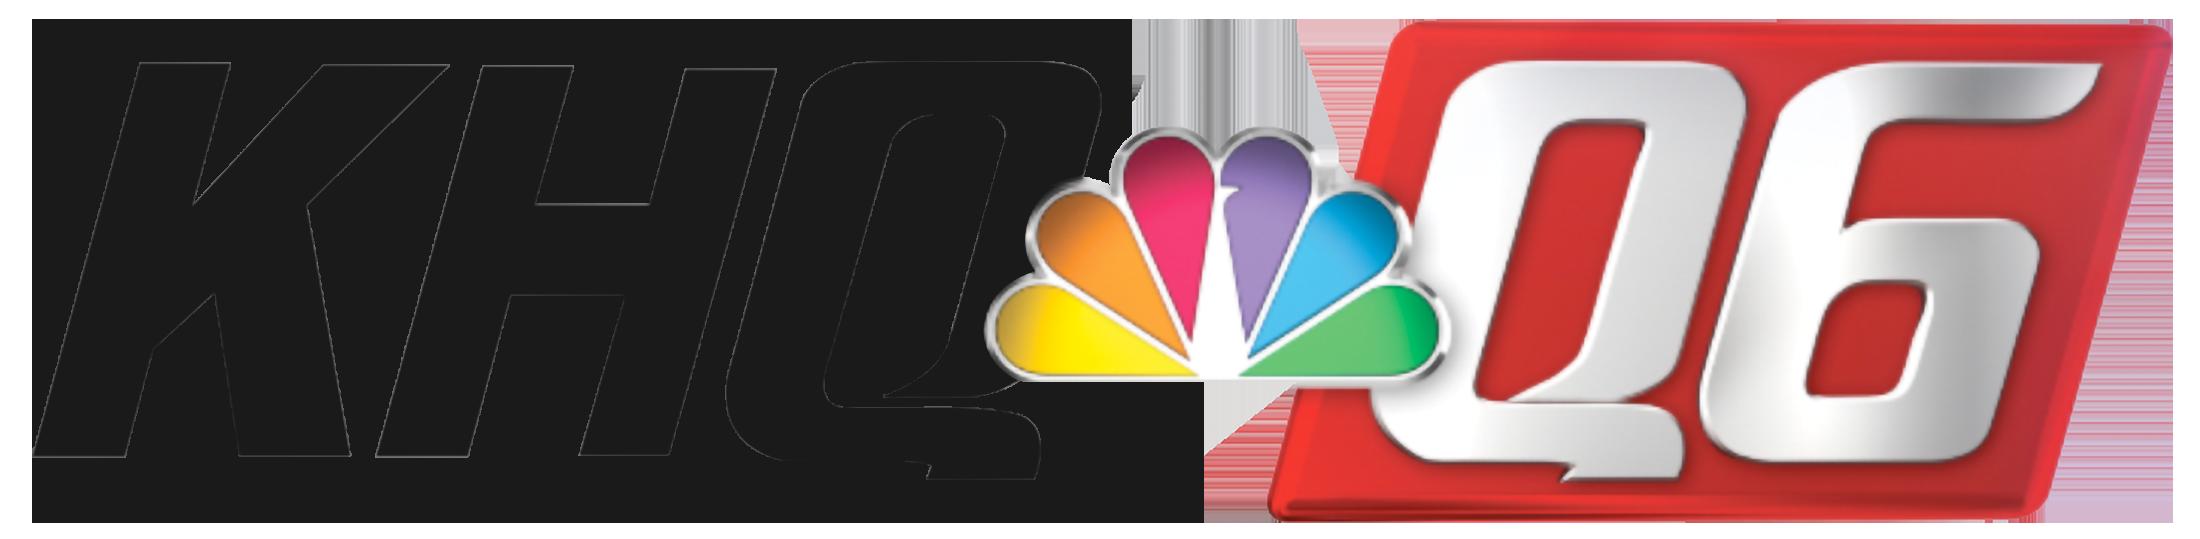 KHQ Local News Logo